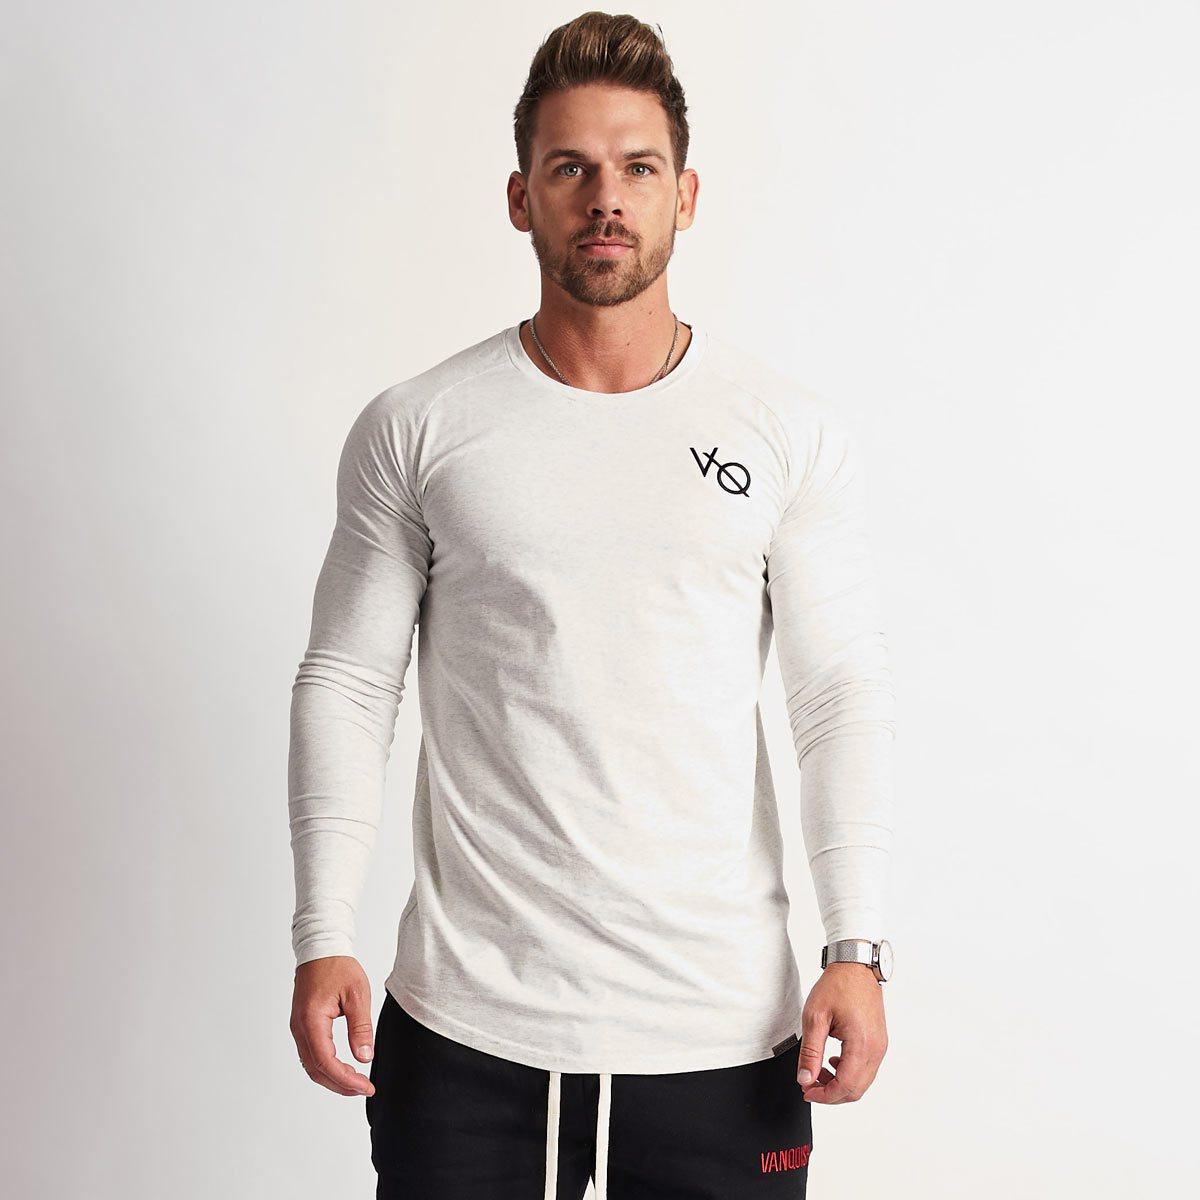 VANQUISH FITNES ECLIPSE(イクリプス) Tシャツ